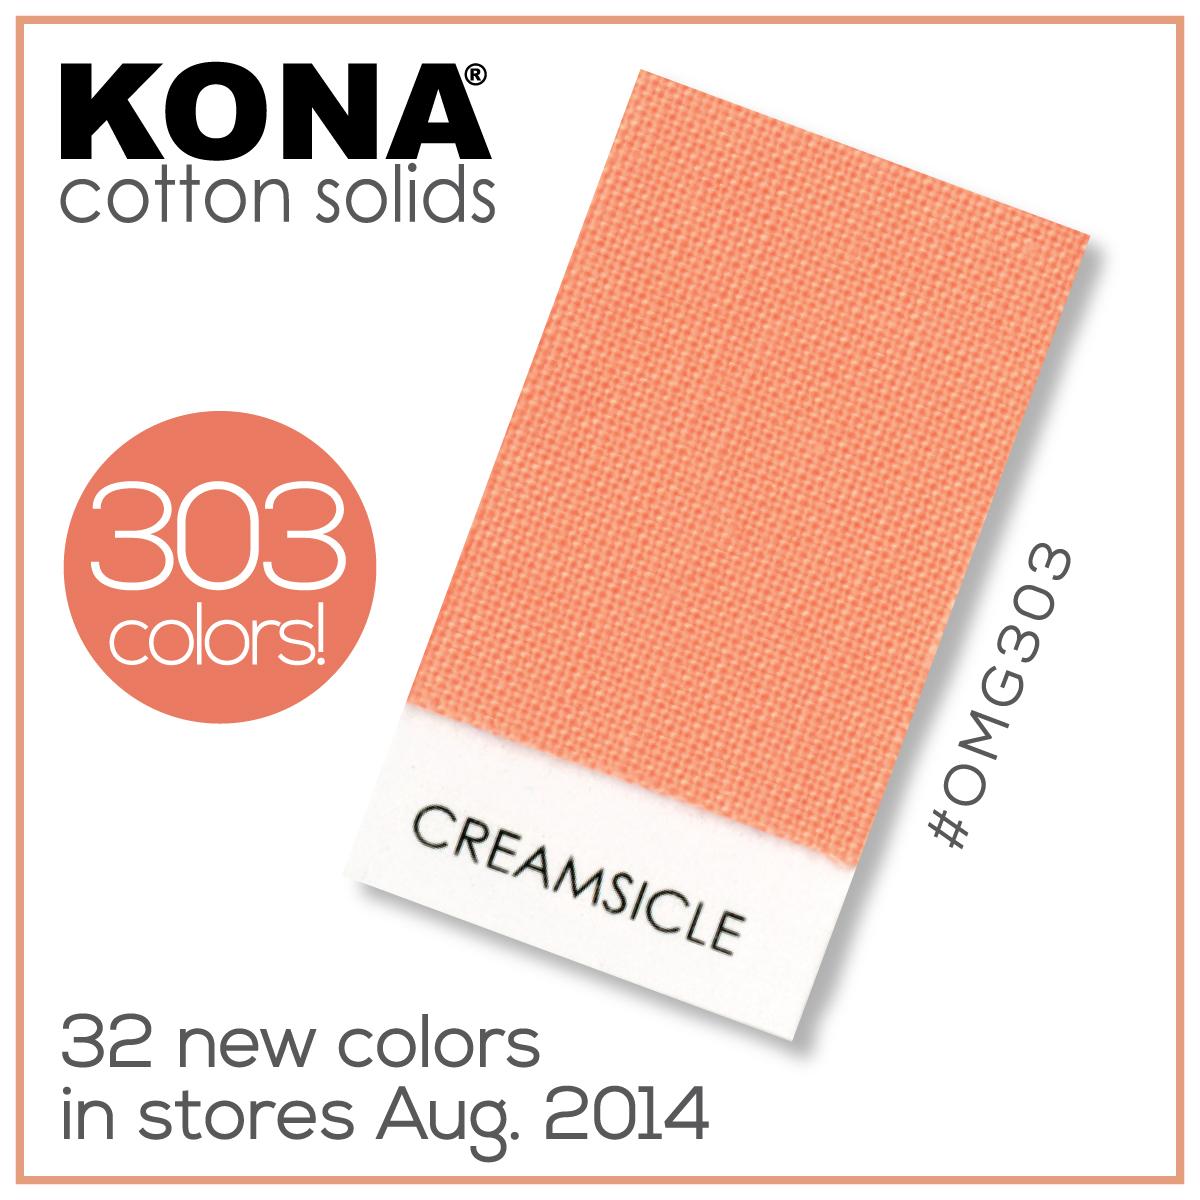 Kona-Creamsicle.jpg